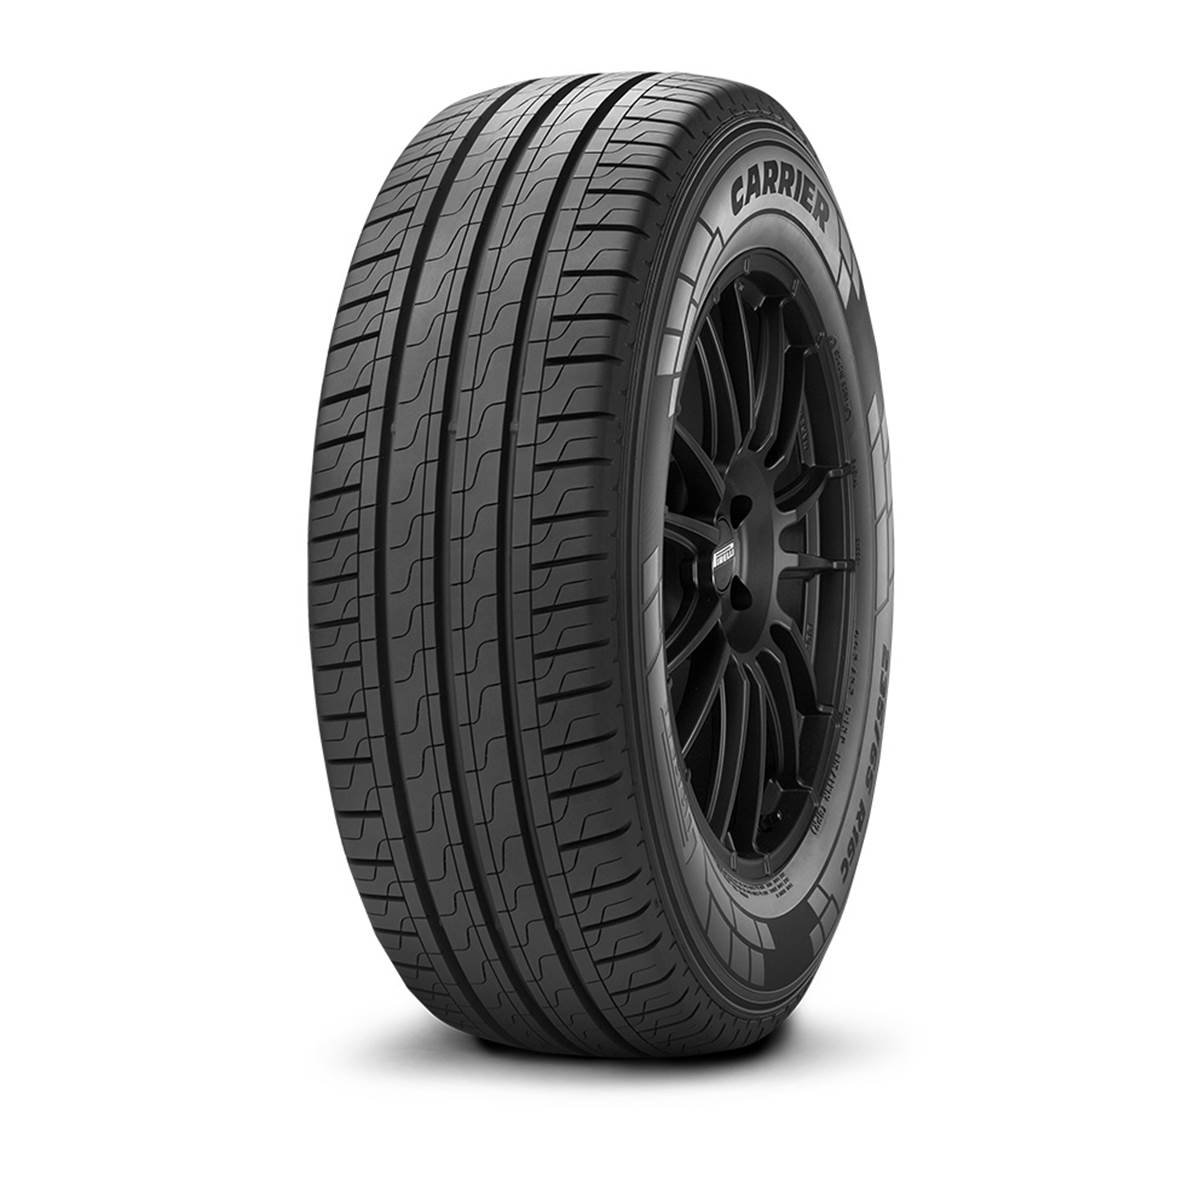 Pneu Camionnette Pirelli 215/75R16 113R Carrier